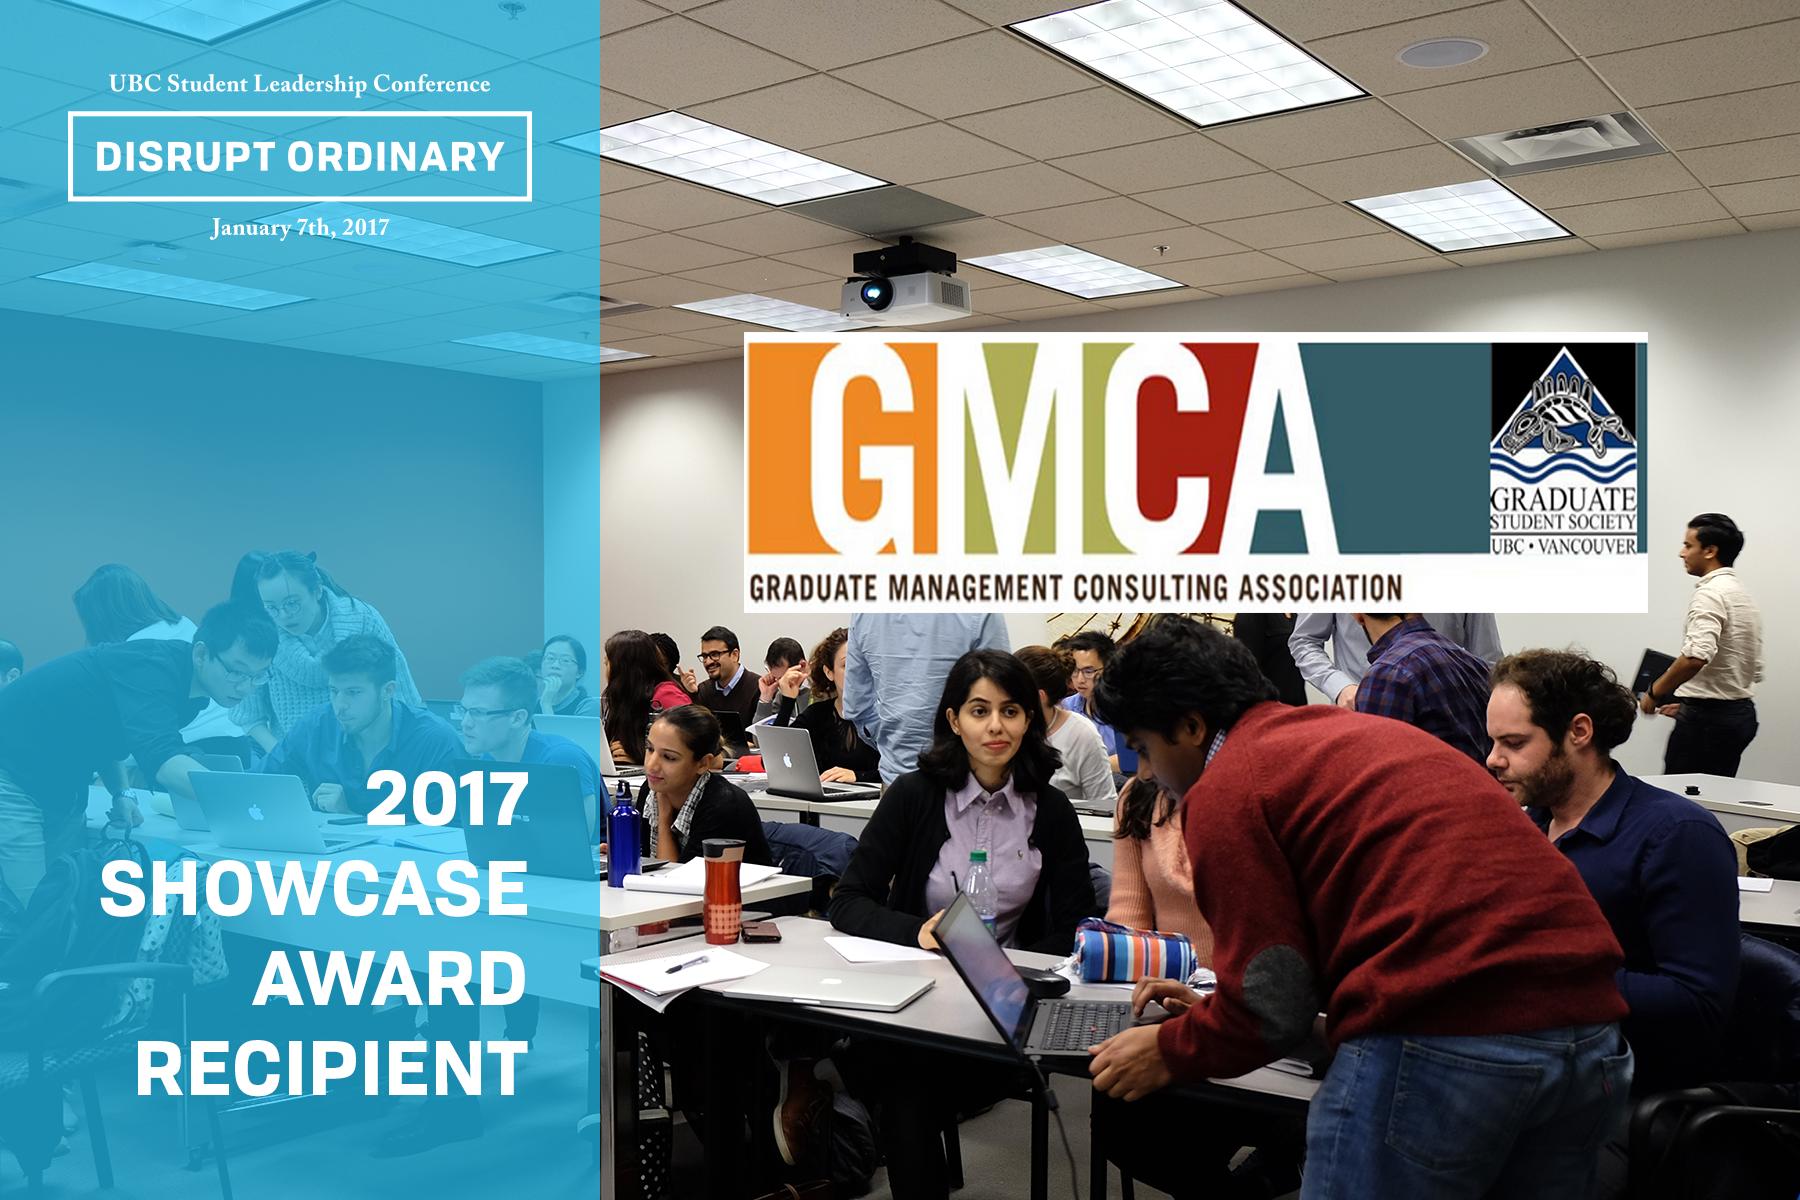 Showcase Award Recipient - Graduate Management Consulting Association